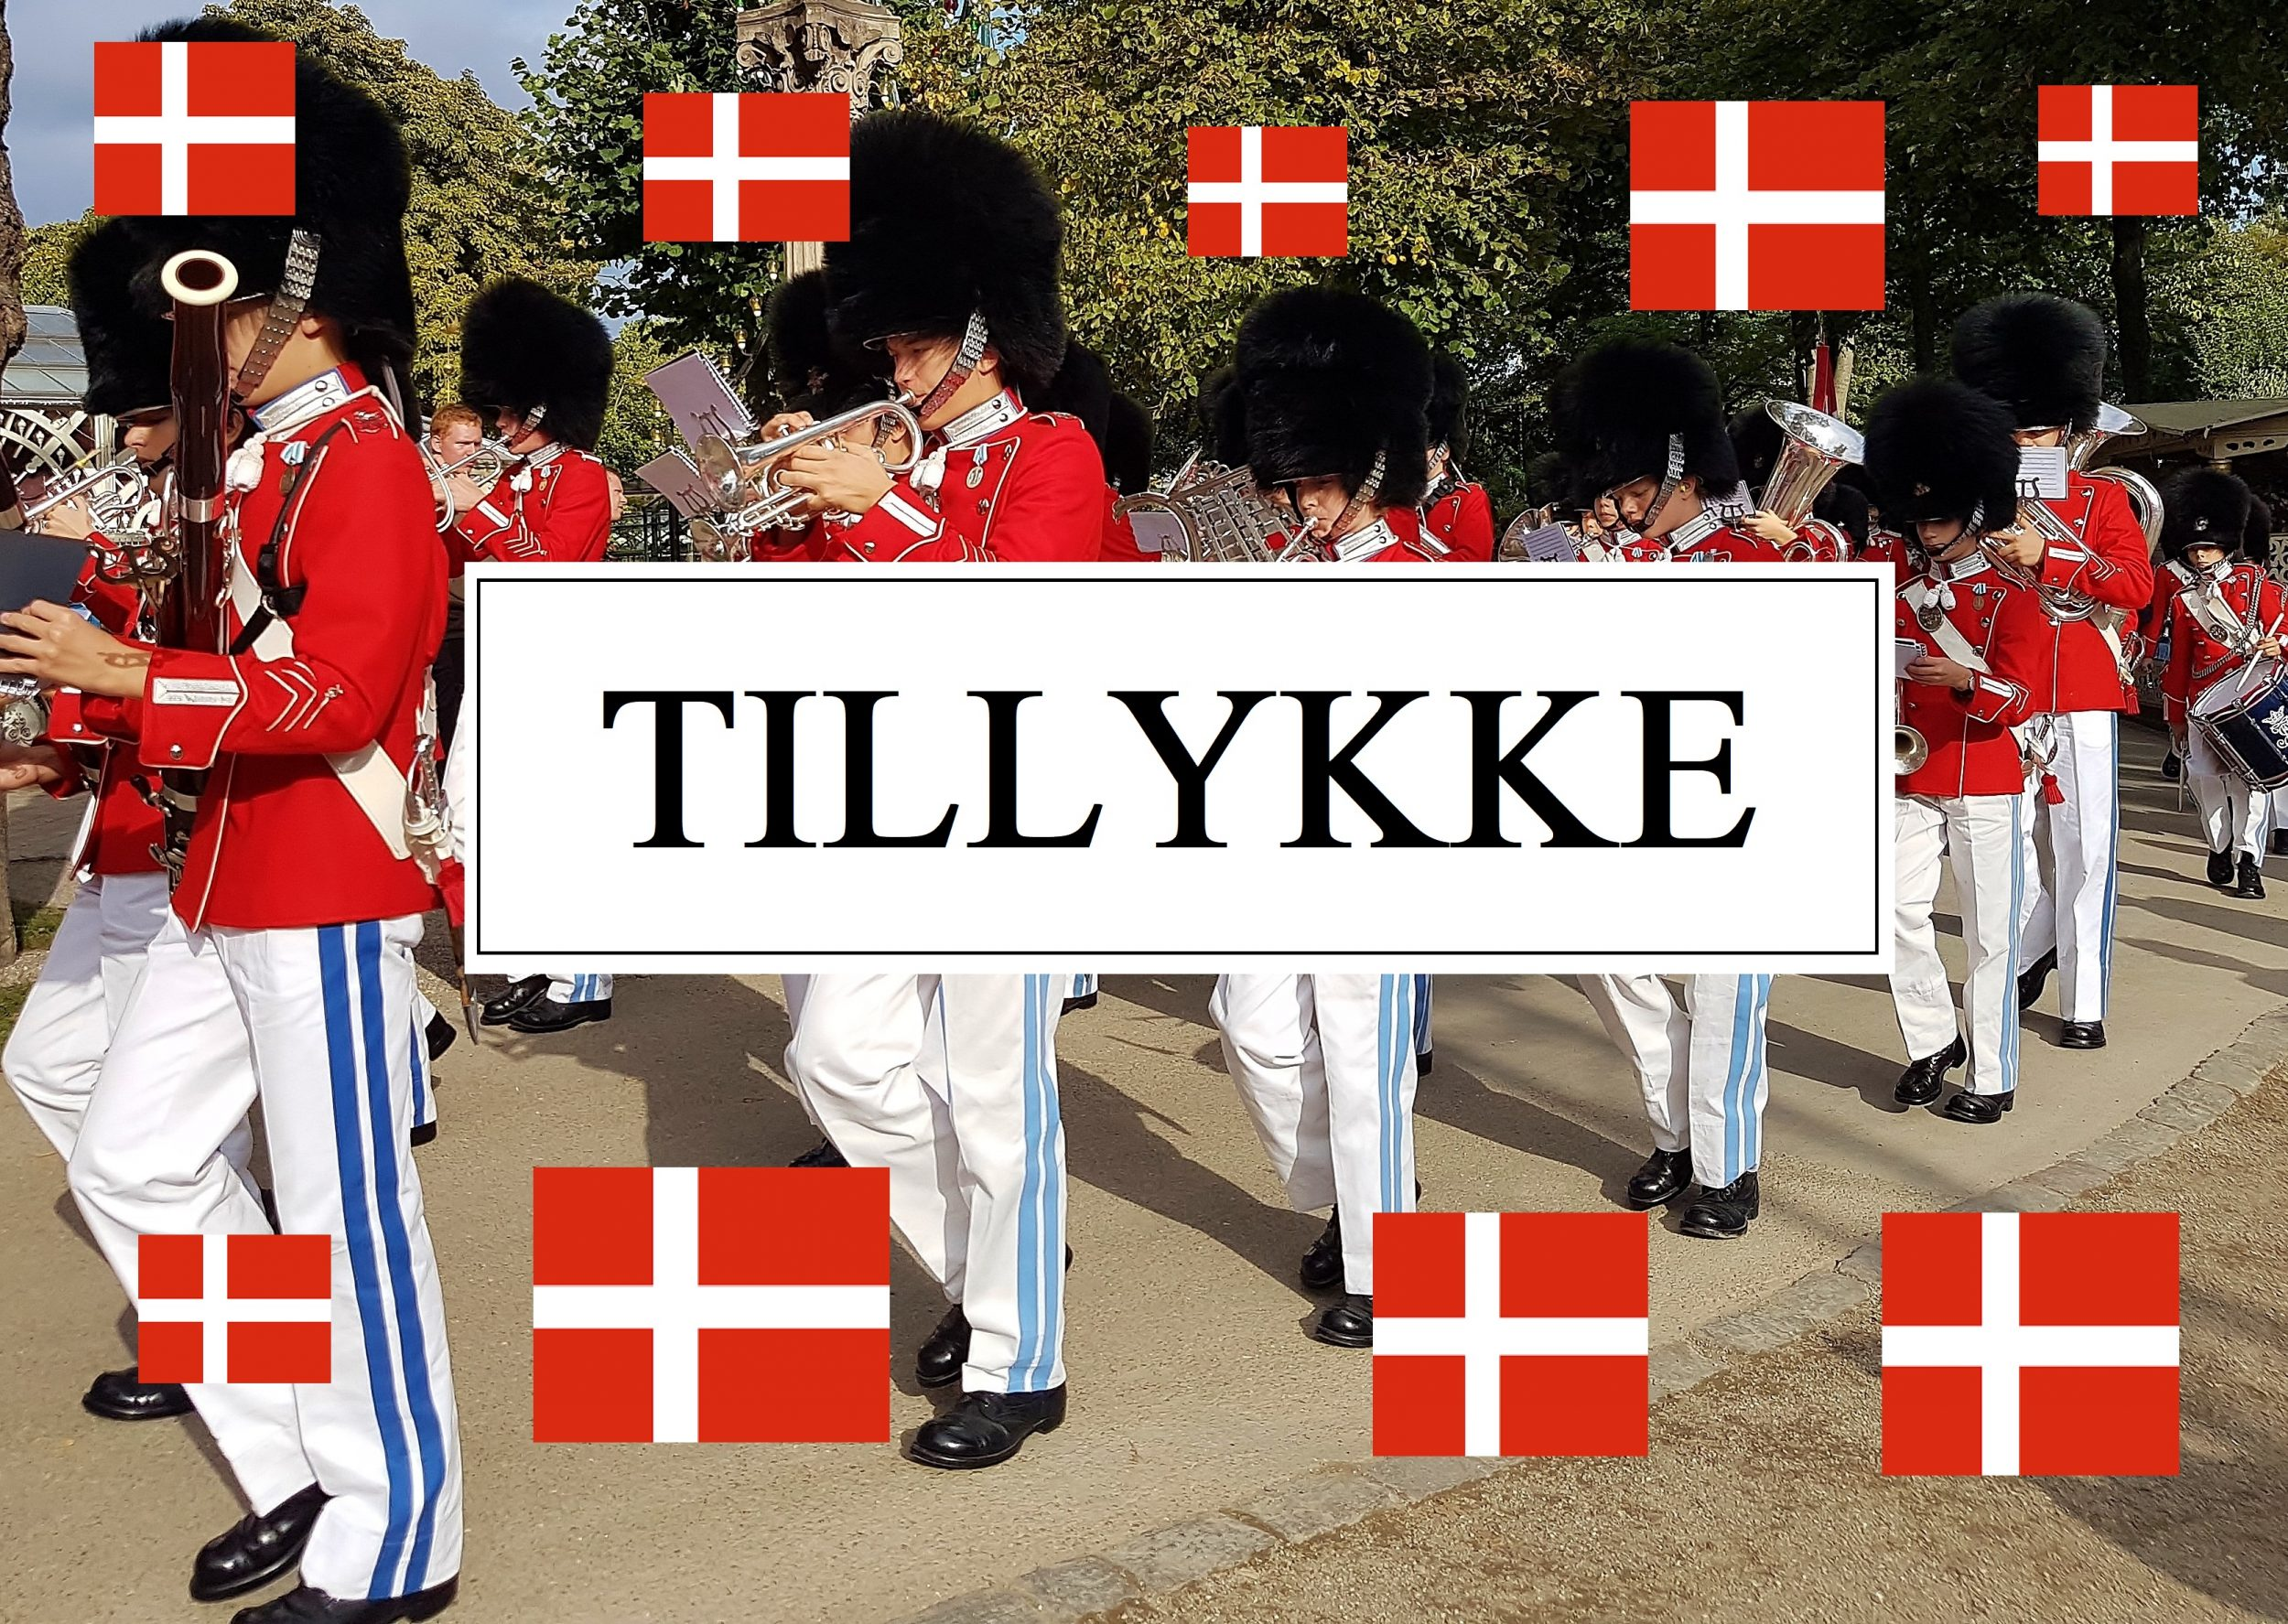 Hjerteligt tillykke til Danmarks dronning, Dronning Margrethe II (f. 16. april 1940).